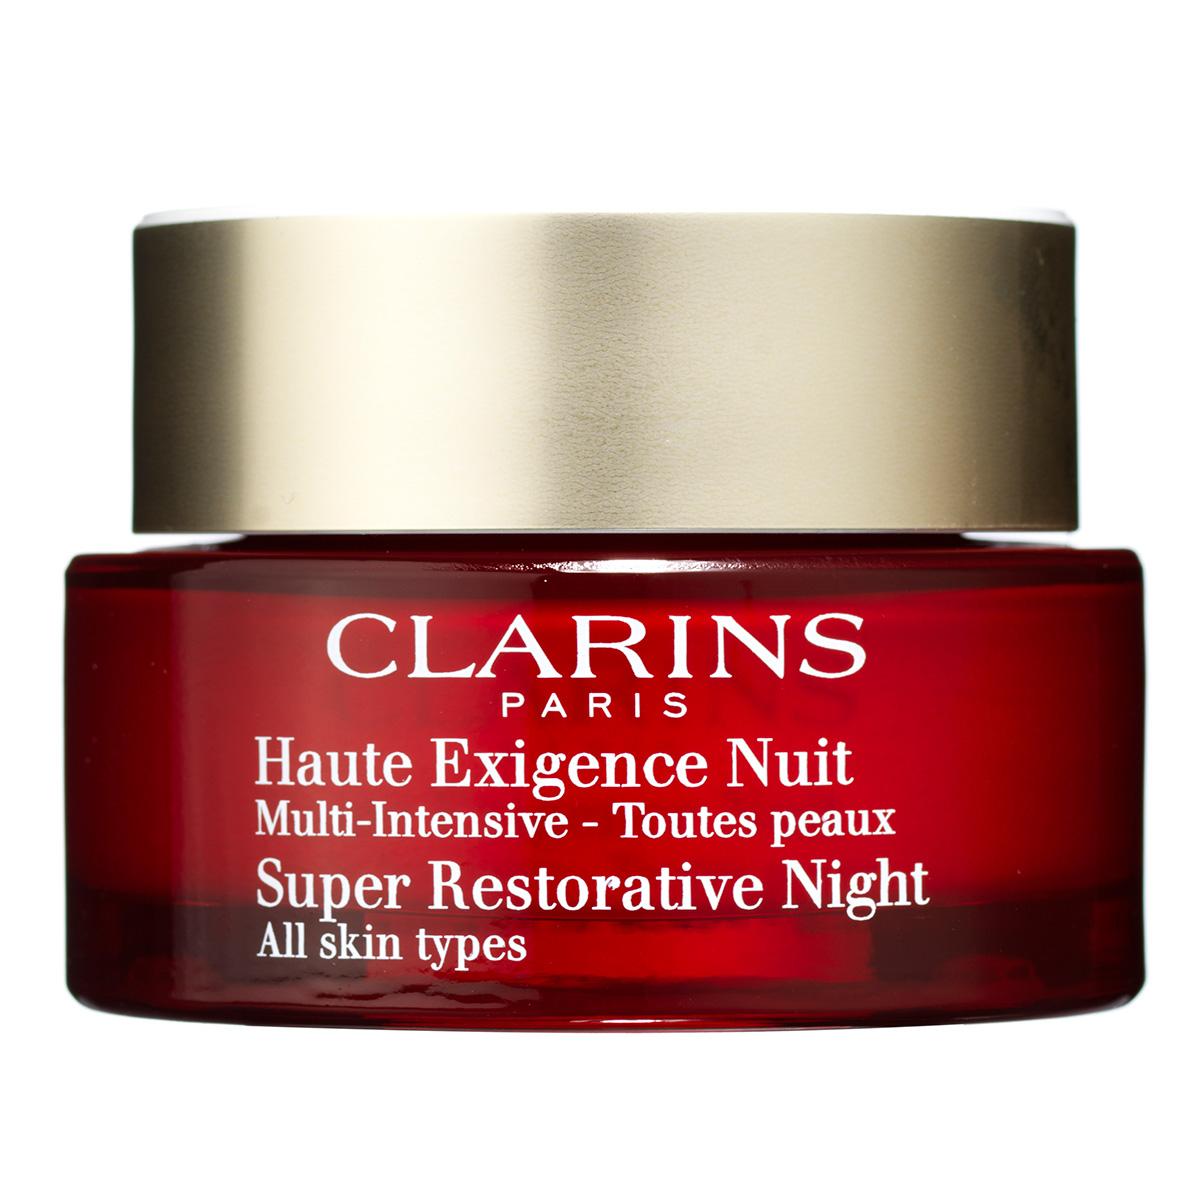 Billede af Clarins Super Restorative Night Cream - 50 ml